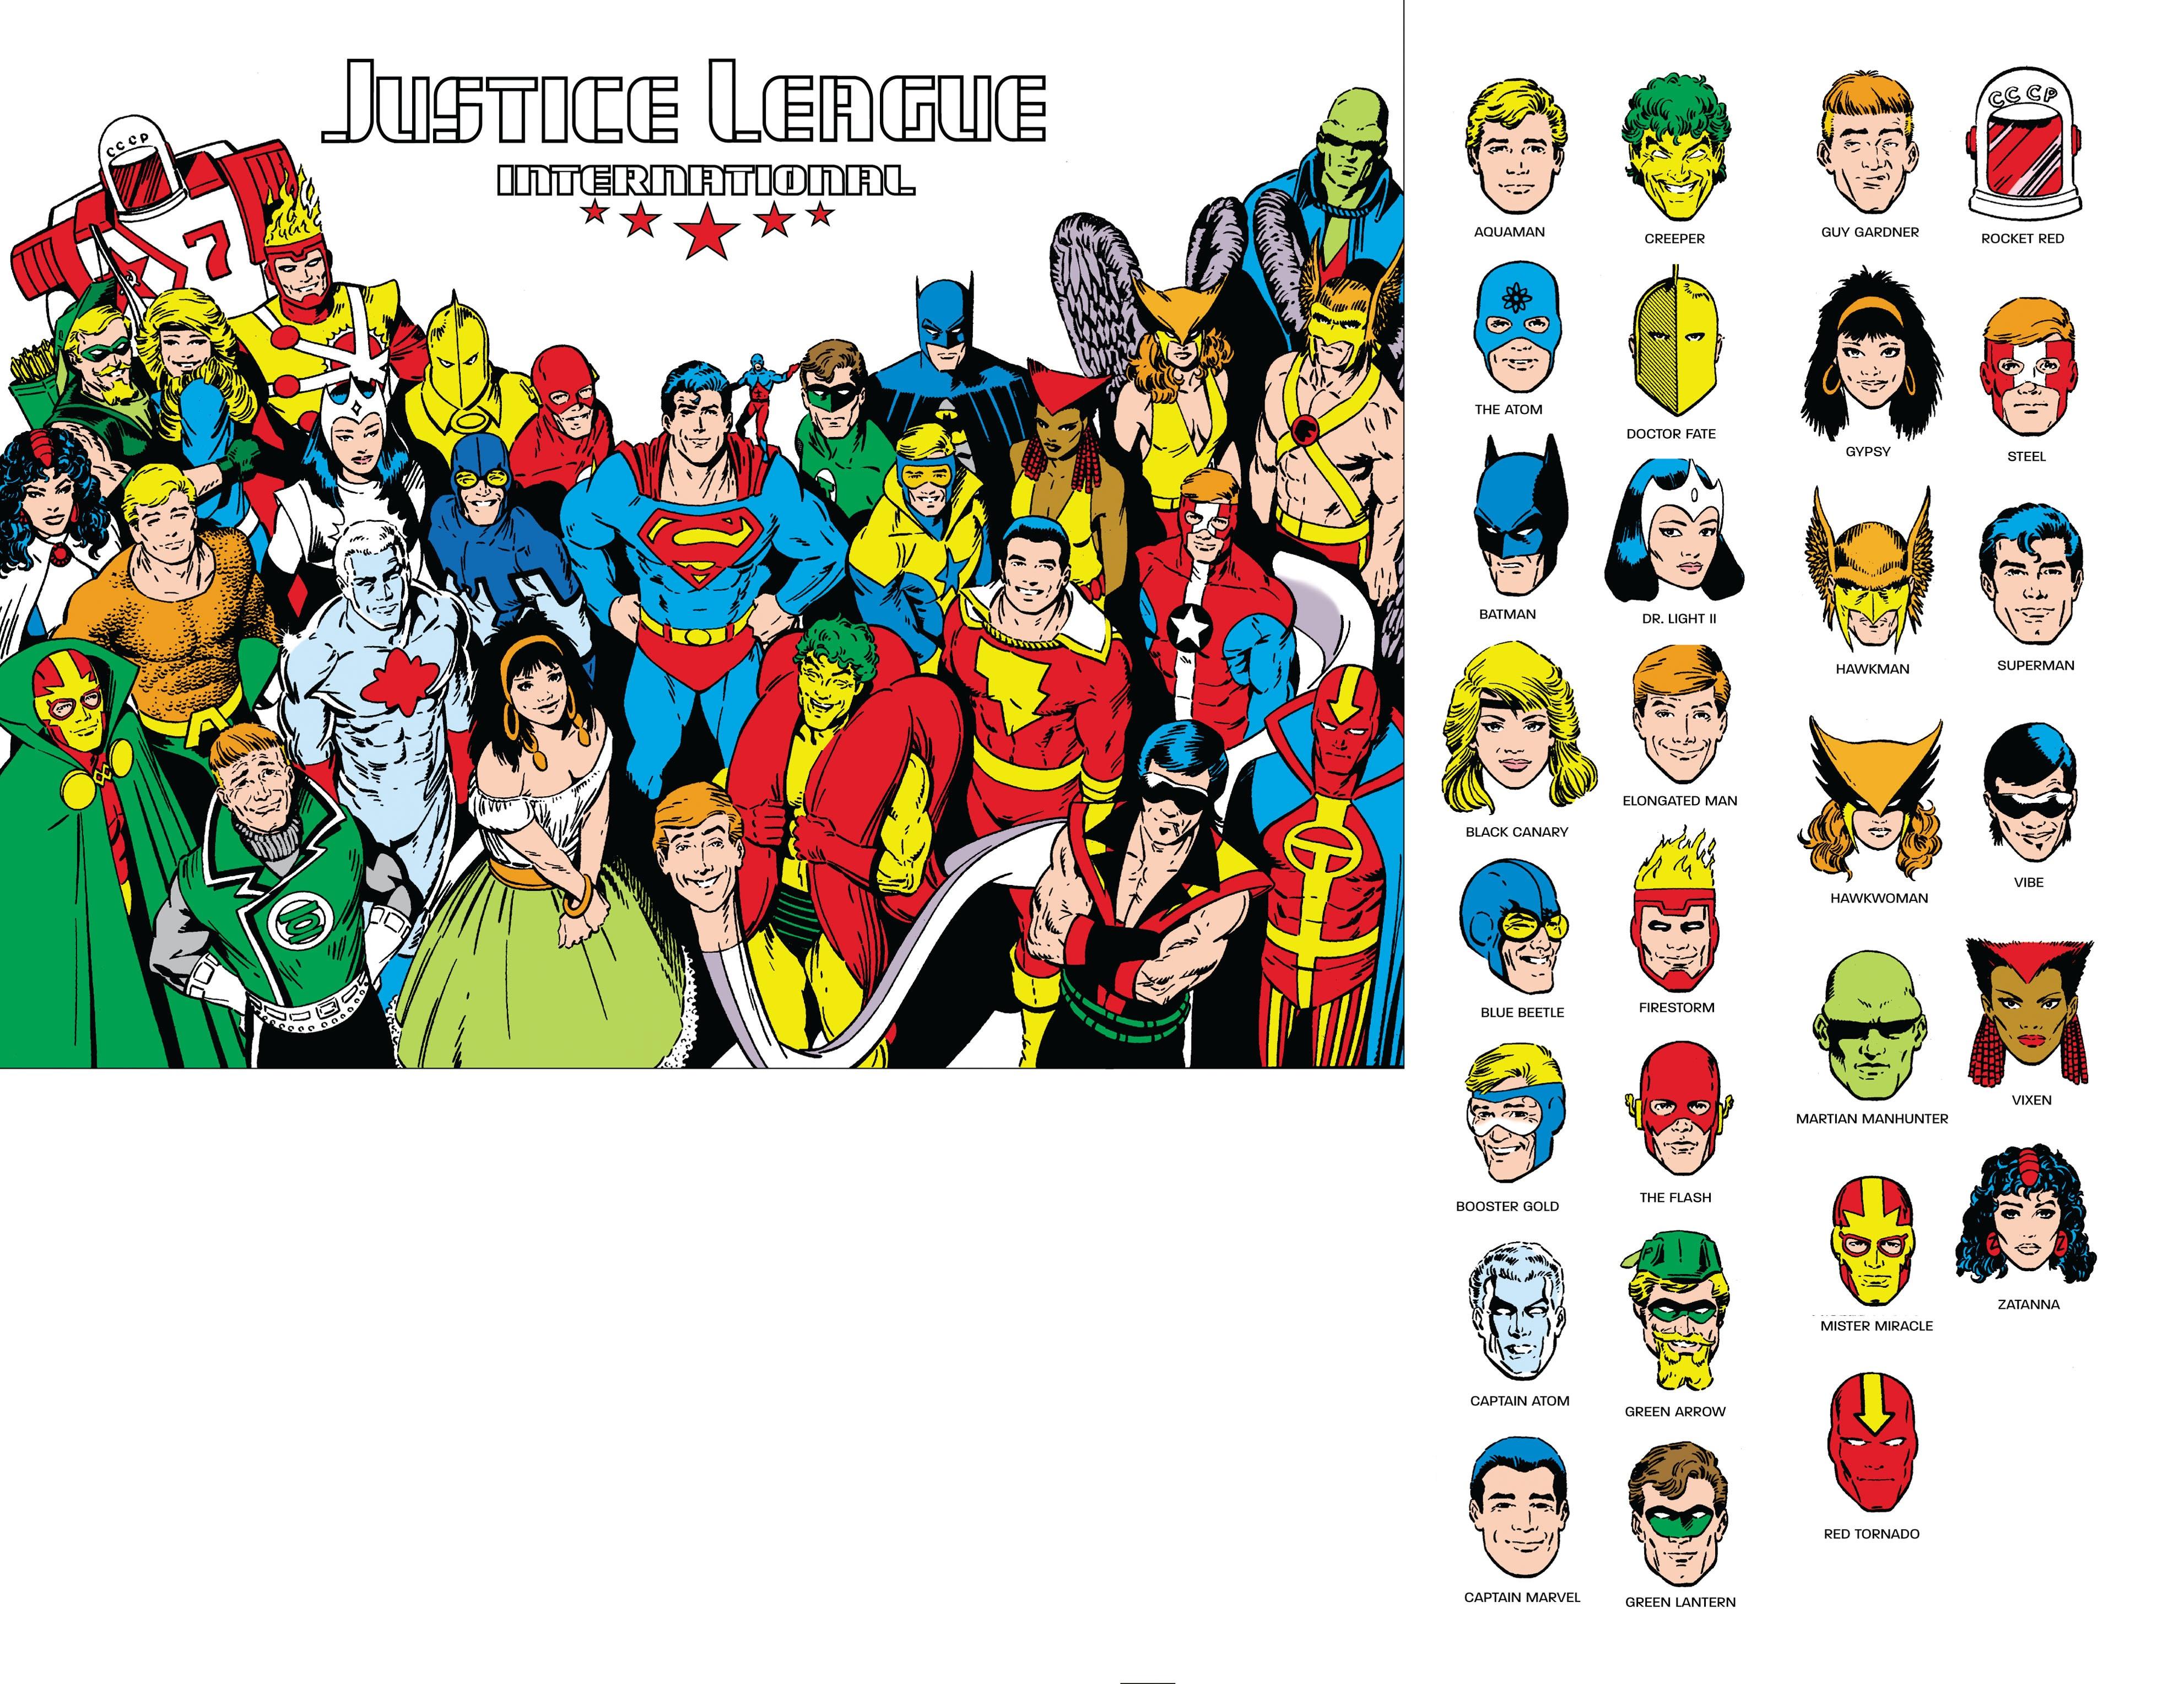 Justice League International 0011.jpg